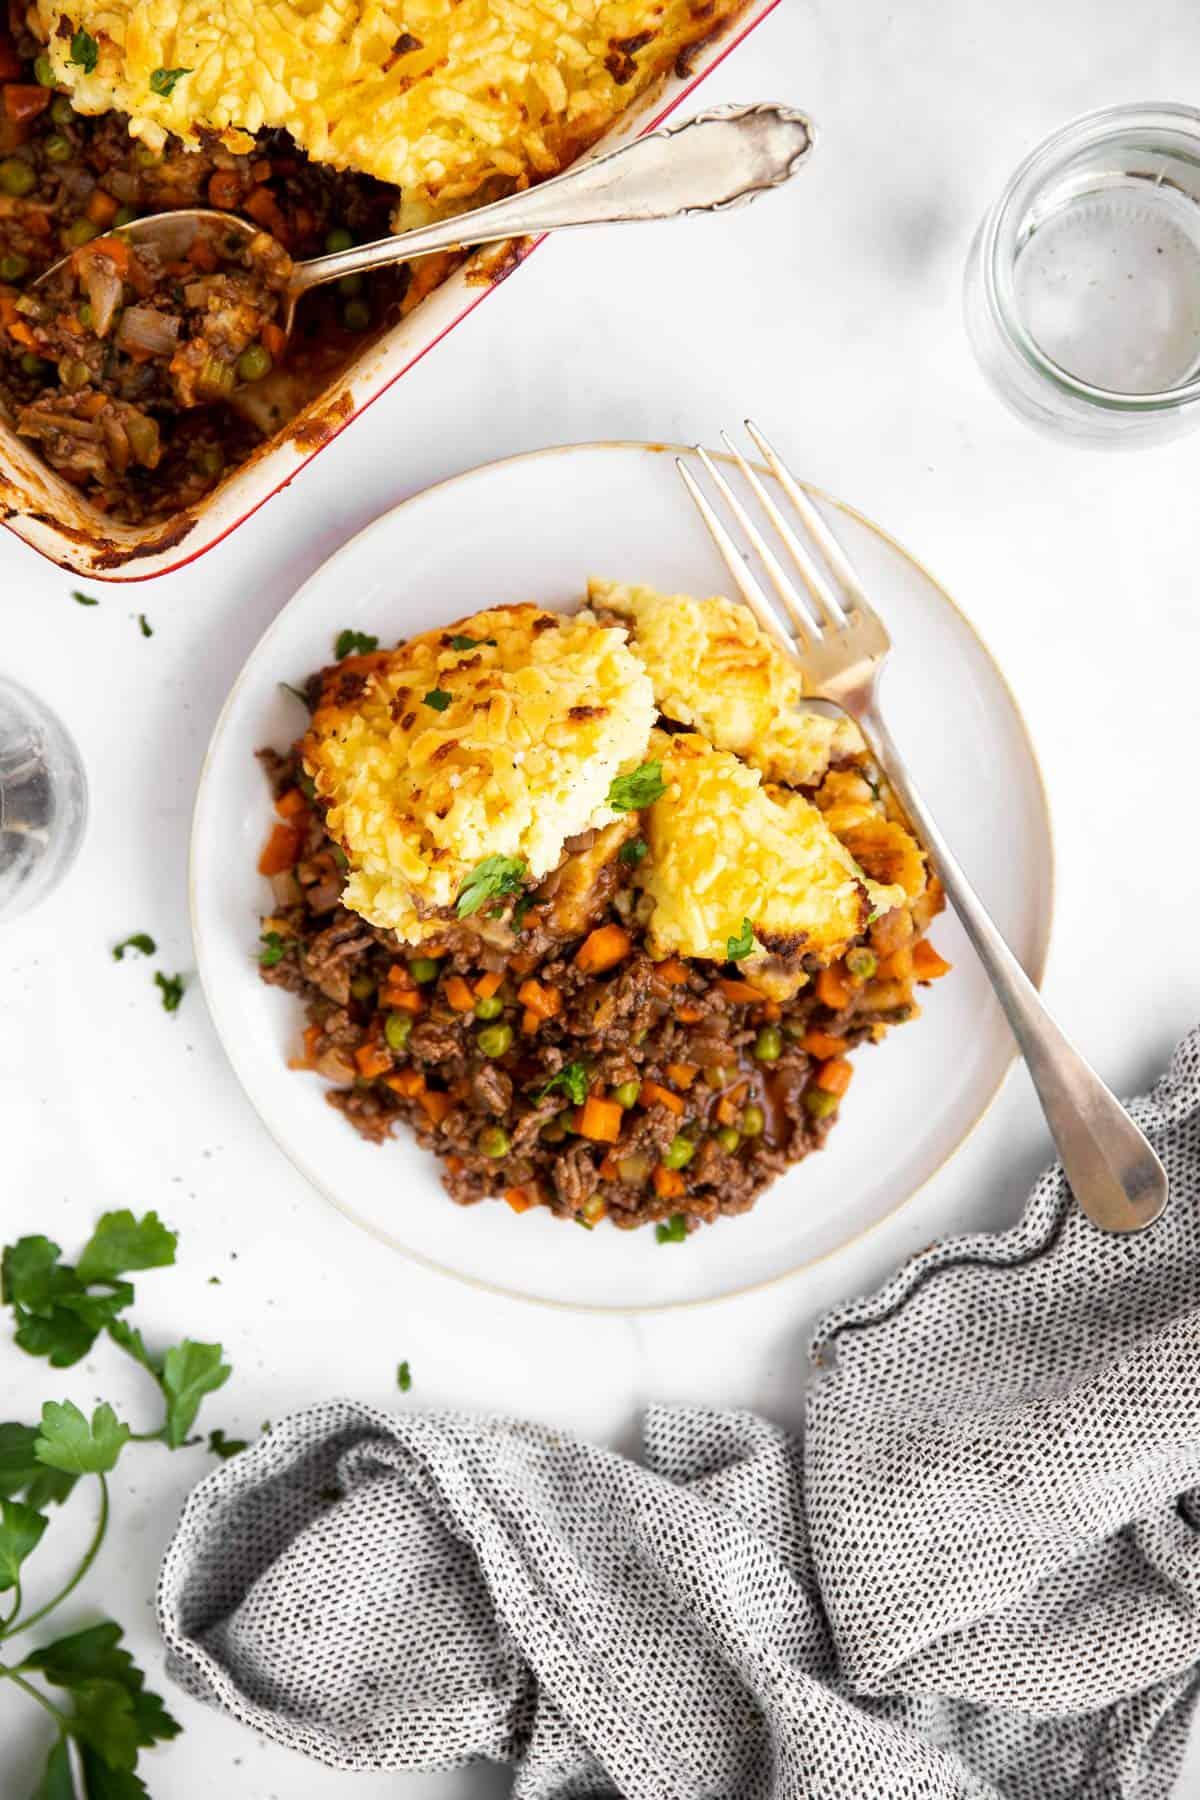 plate with shepherd's pie